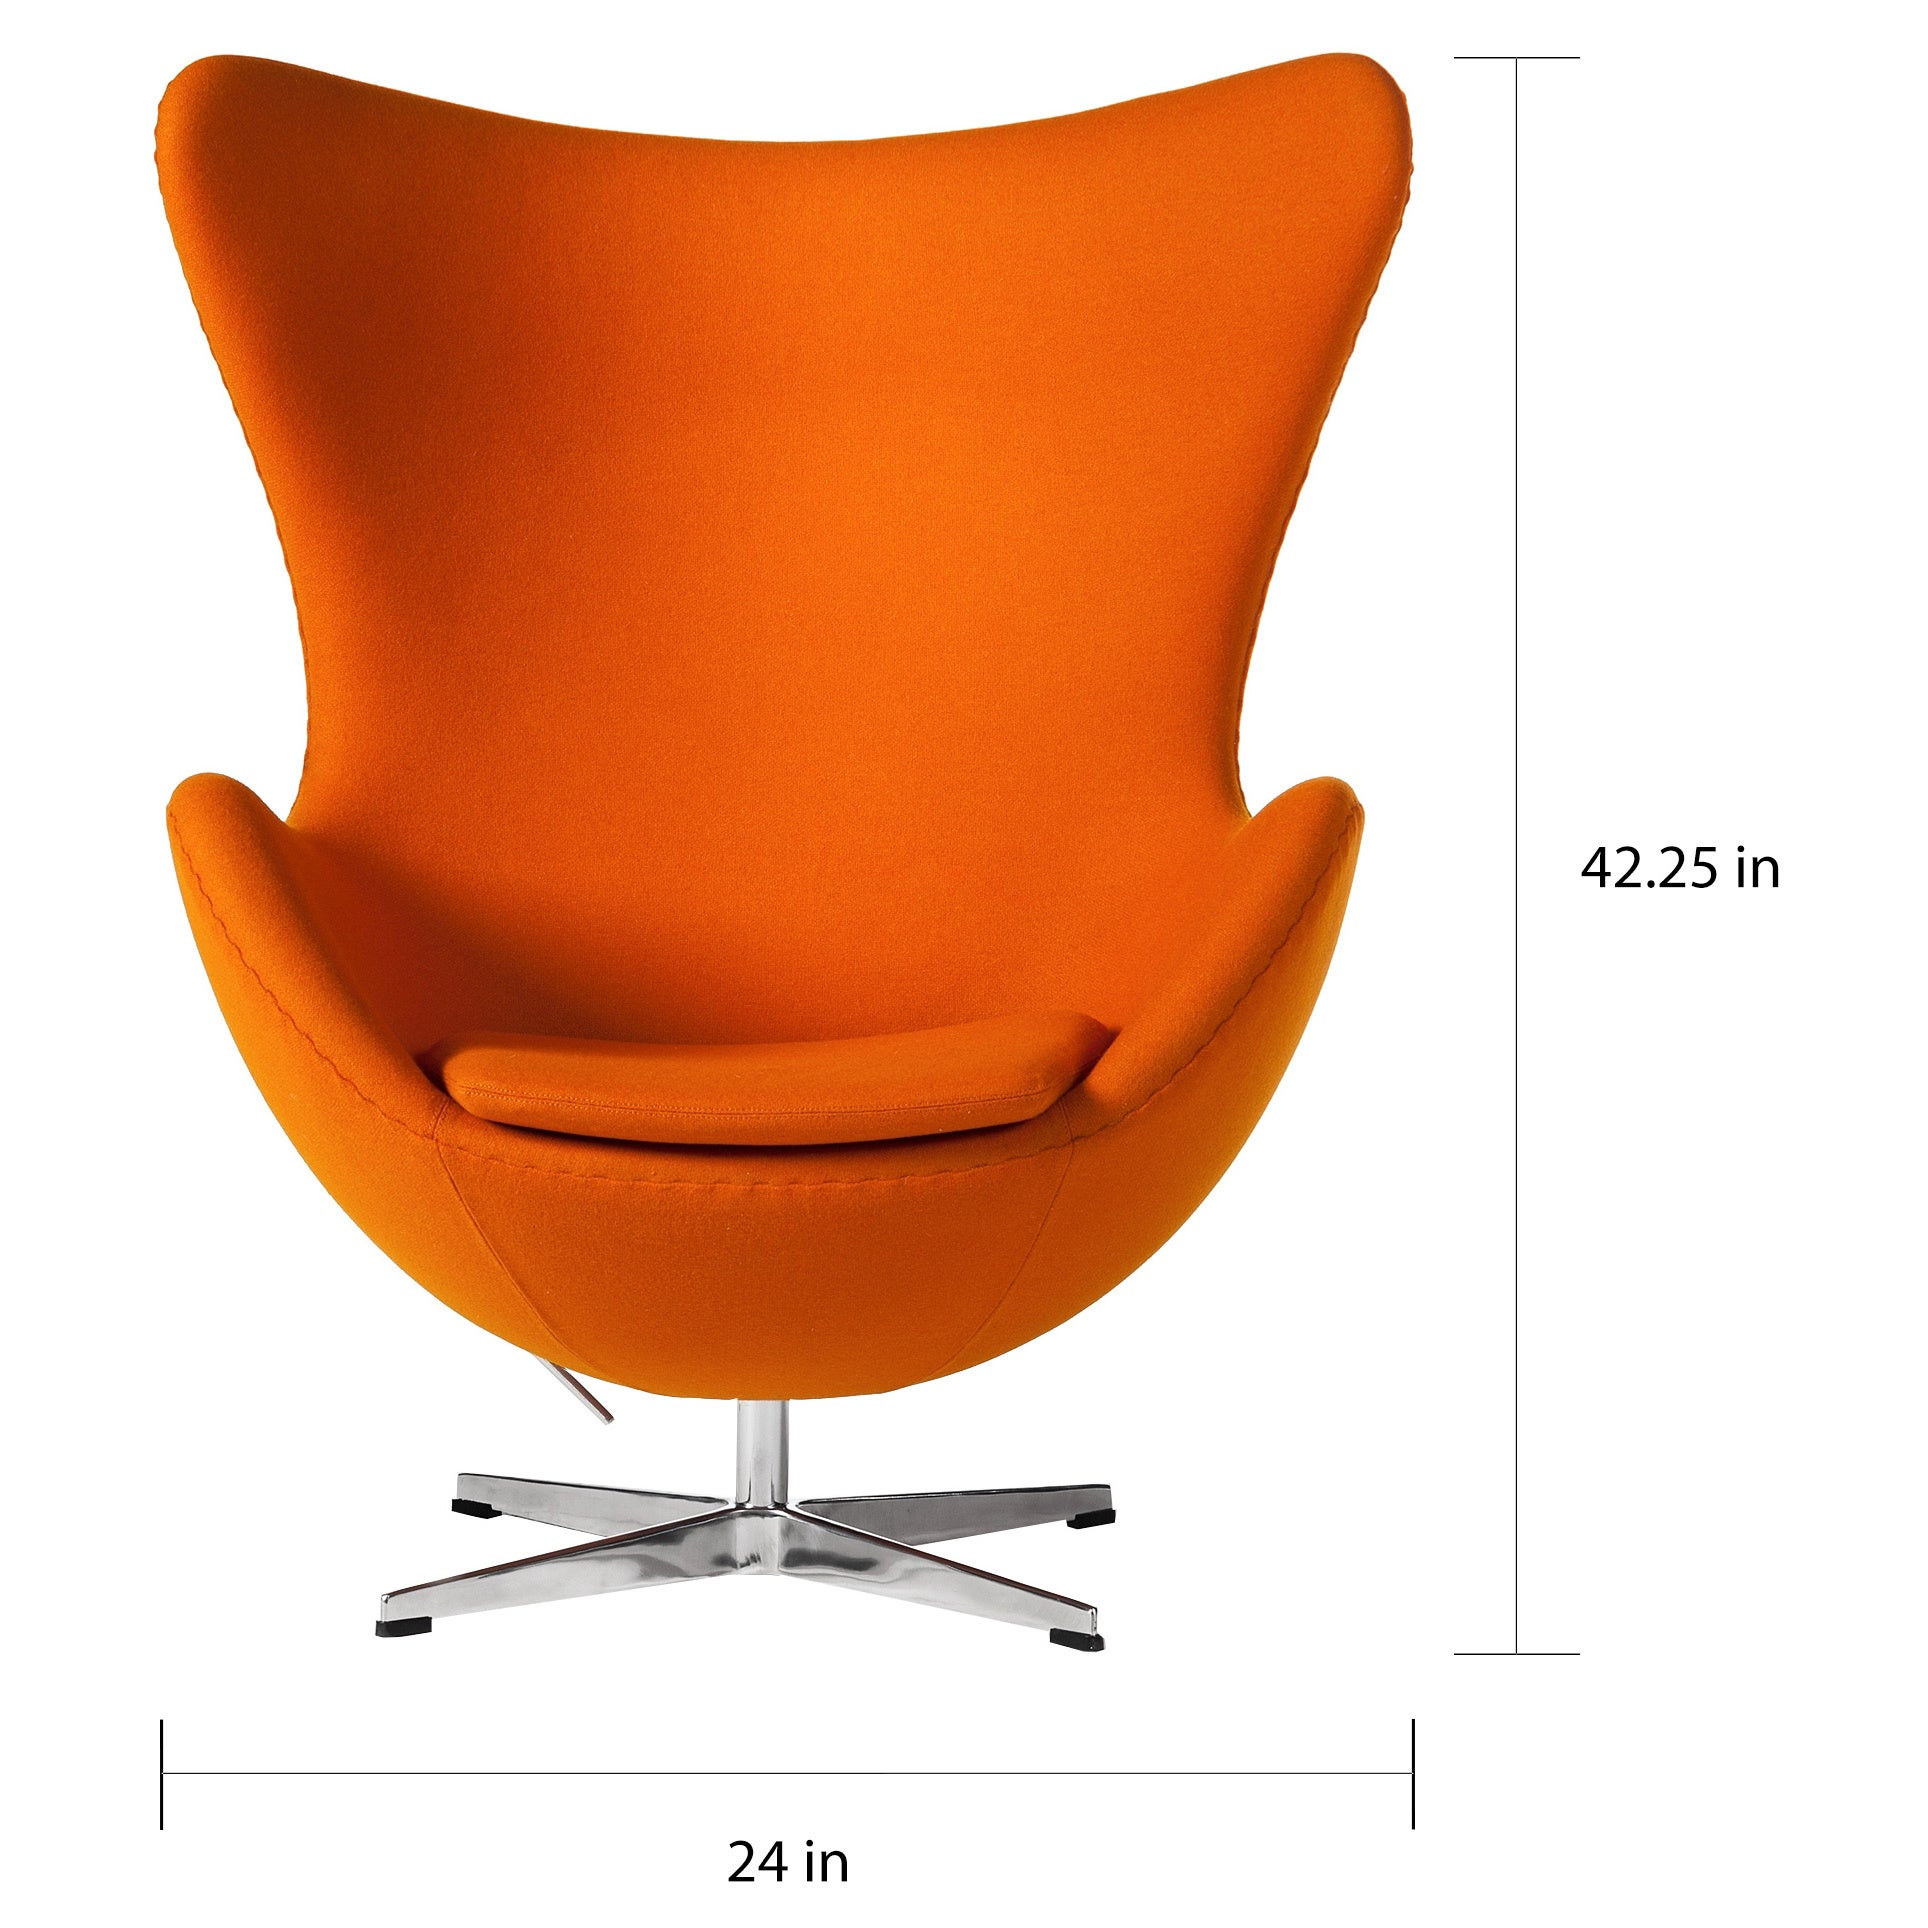 Ullbosta Yellow Egg Swivel Chair